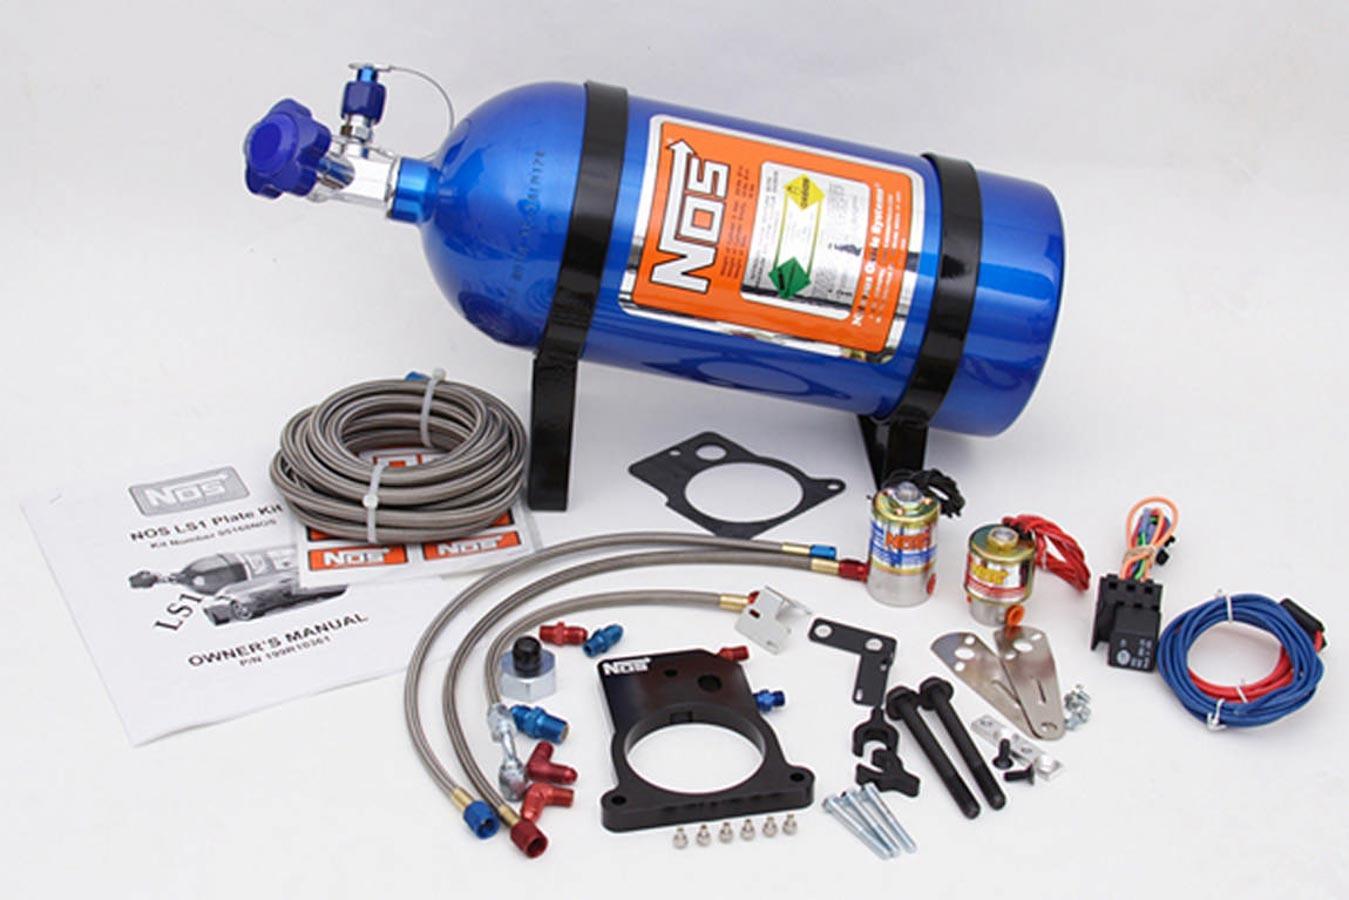 Nitrous Oxide Systems 05168 Nitrous Oxide System, GM LS1 EFI, Wet, Single Stage, 100-200 HP, 10 lb Bottle, Blue, GM LS-Series, LS1 3-Bolt Throttle Body, Kit